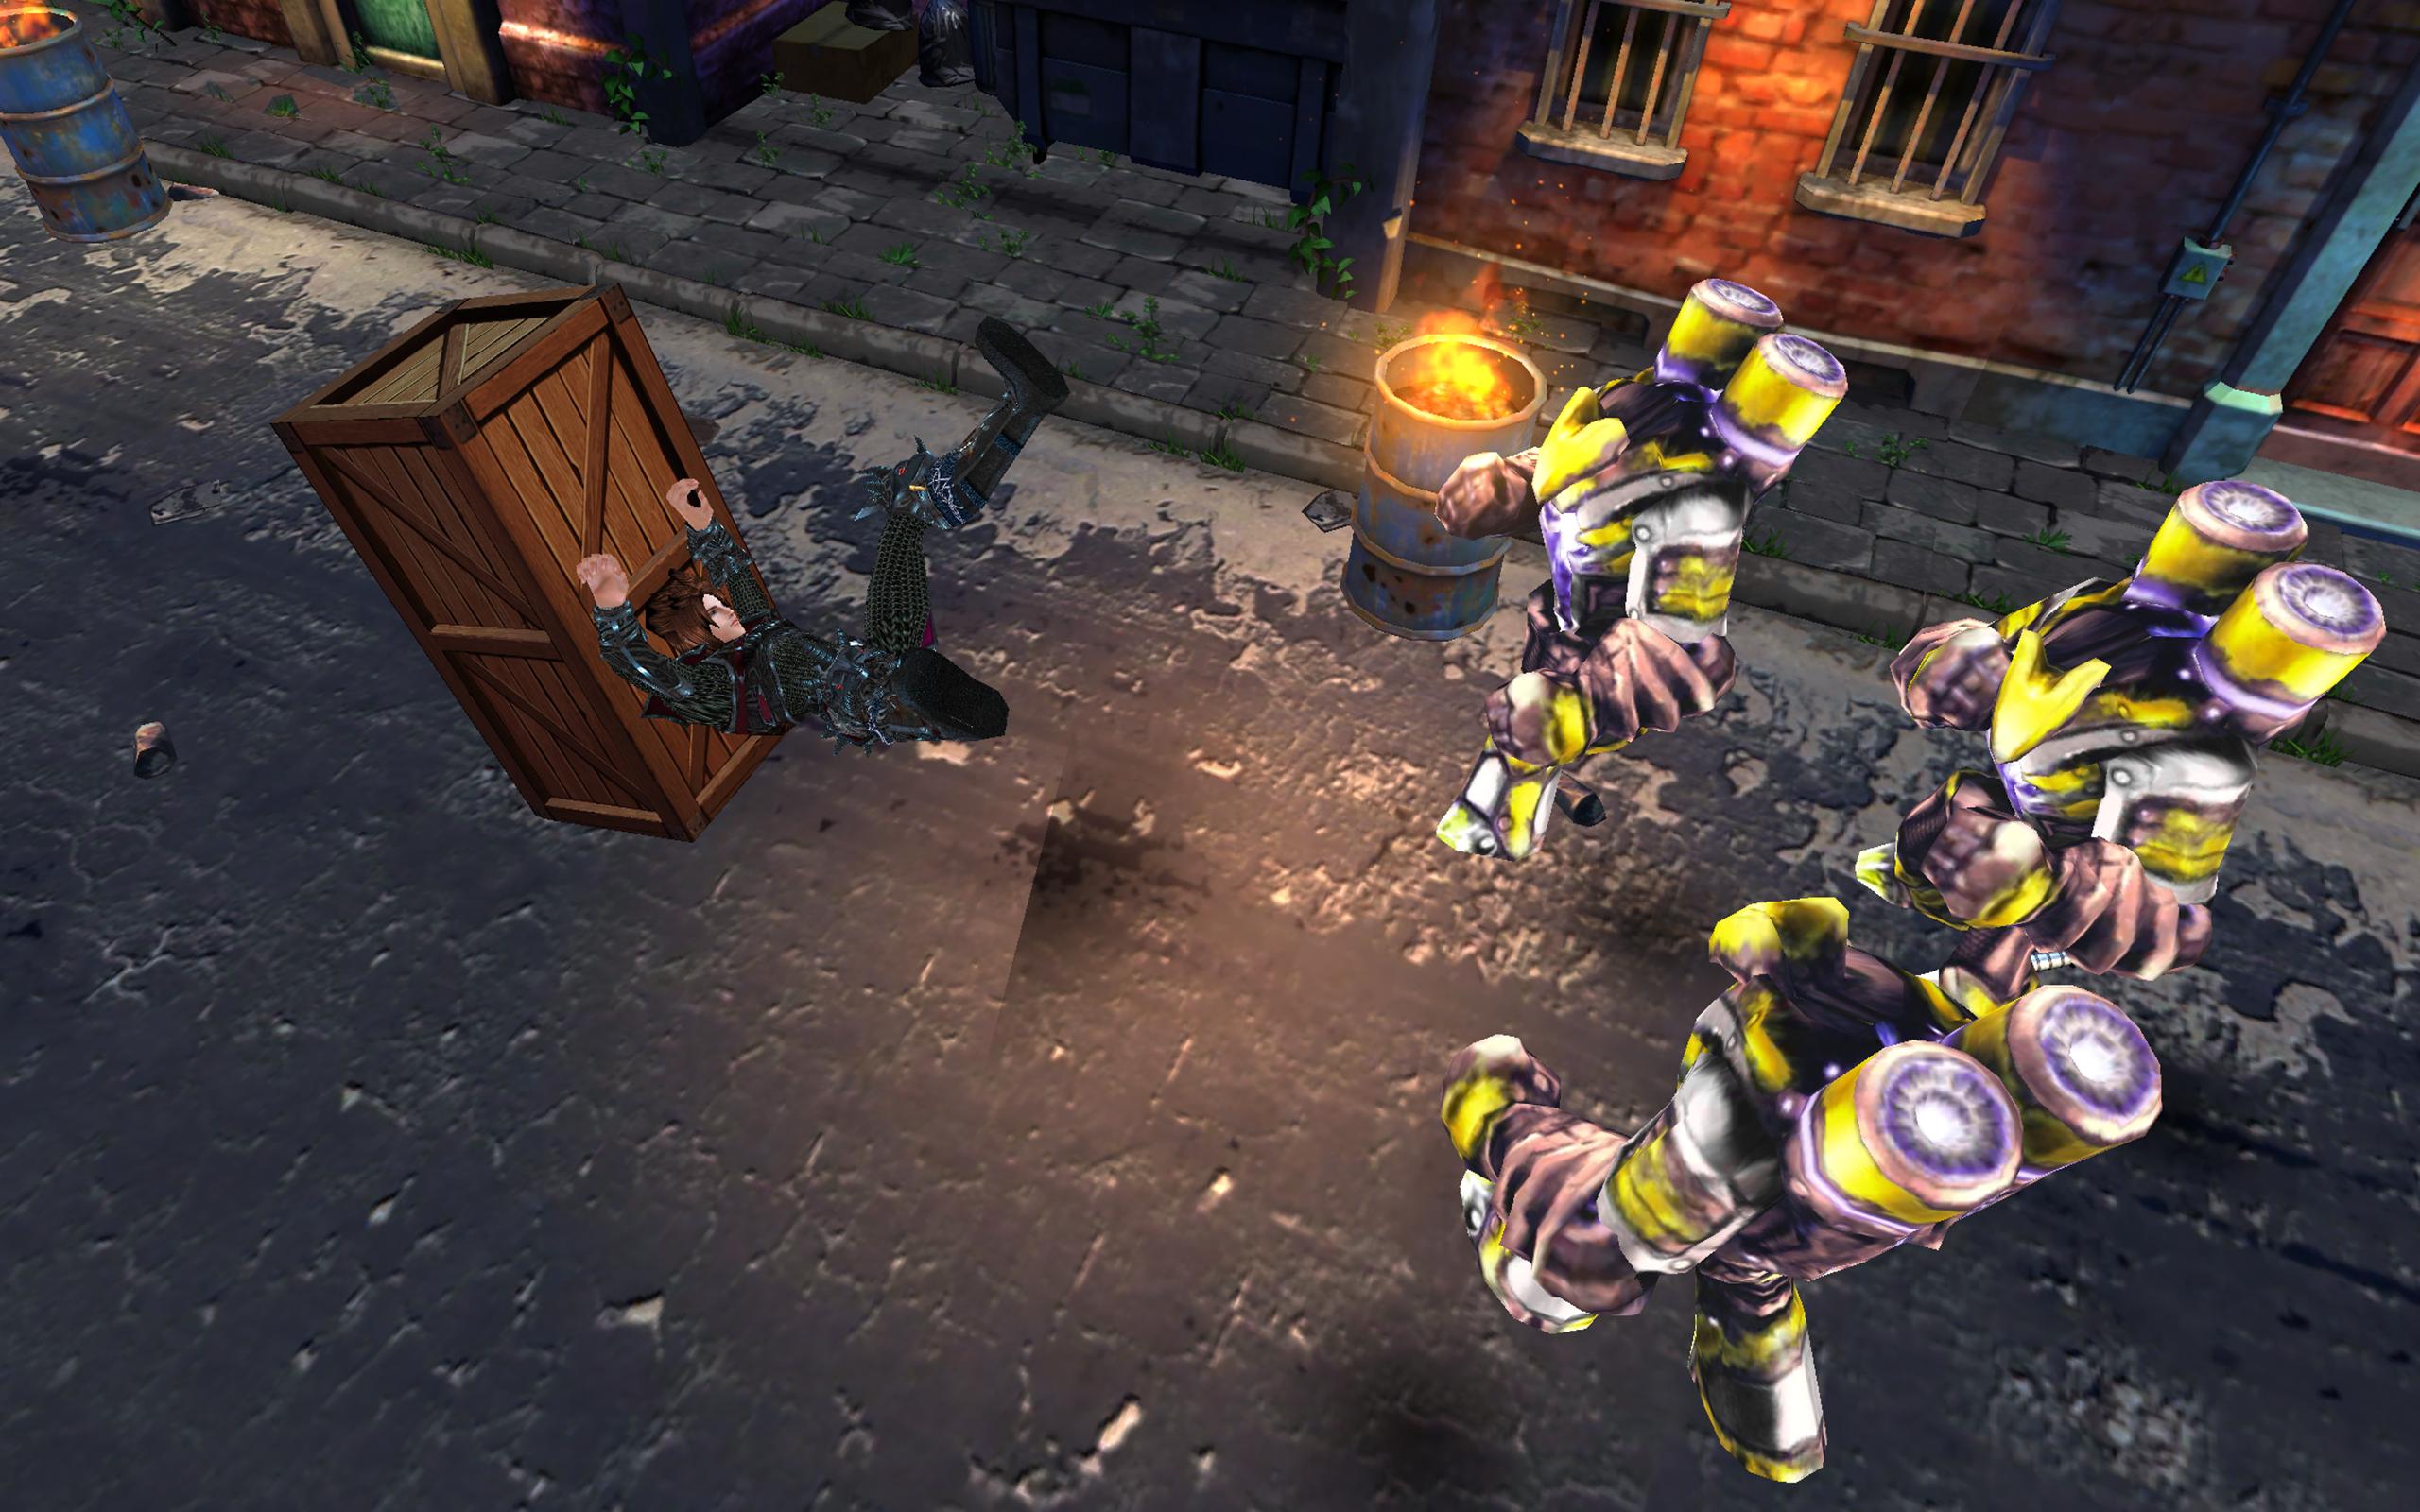 Robot Street Fighter: Kung Fu Games: Amazon.es: Appstore ...